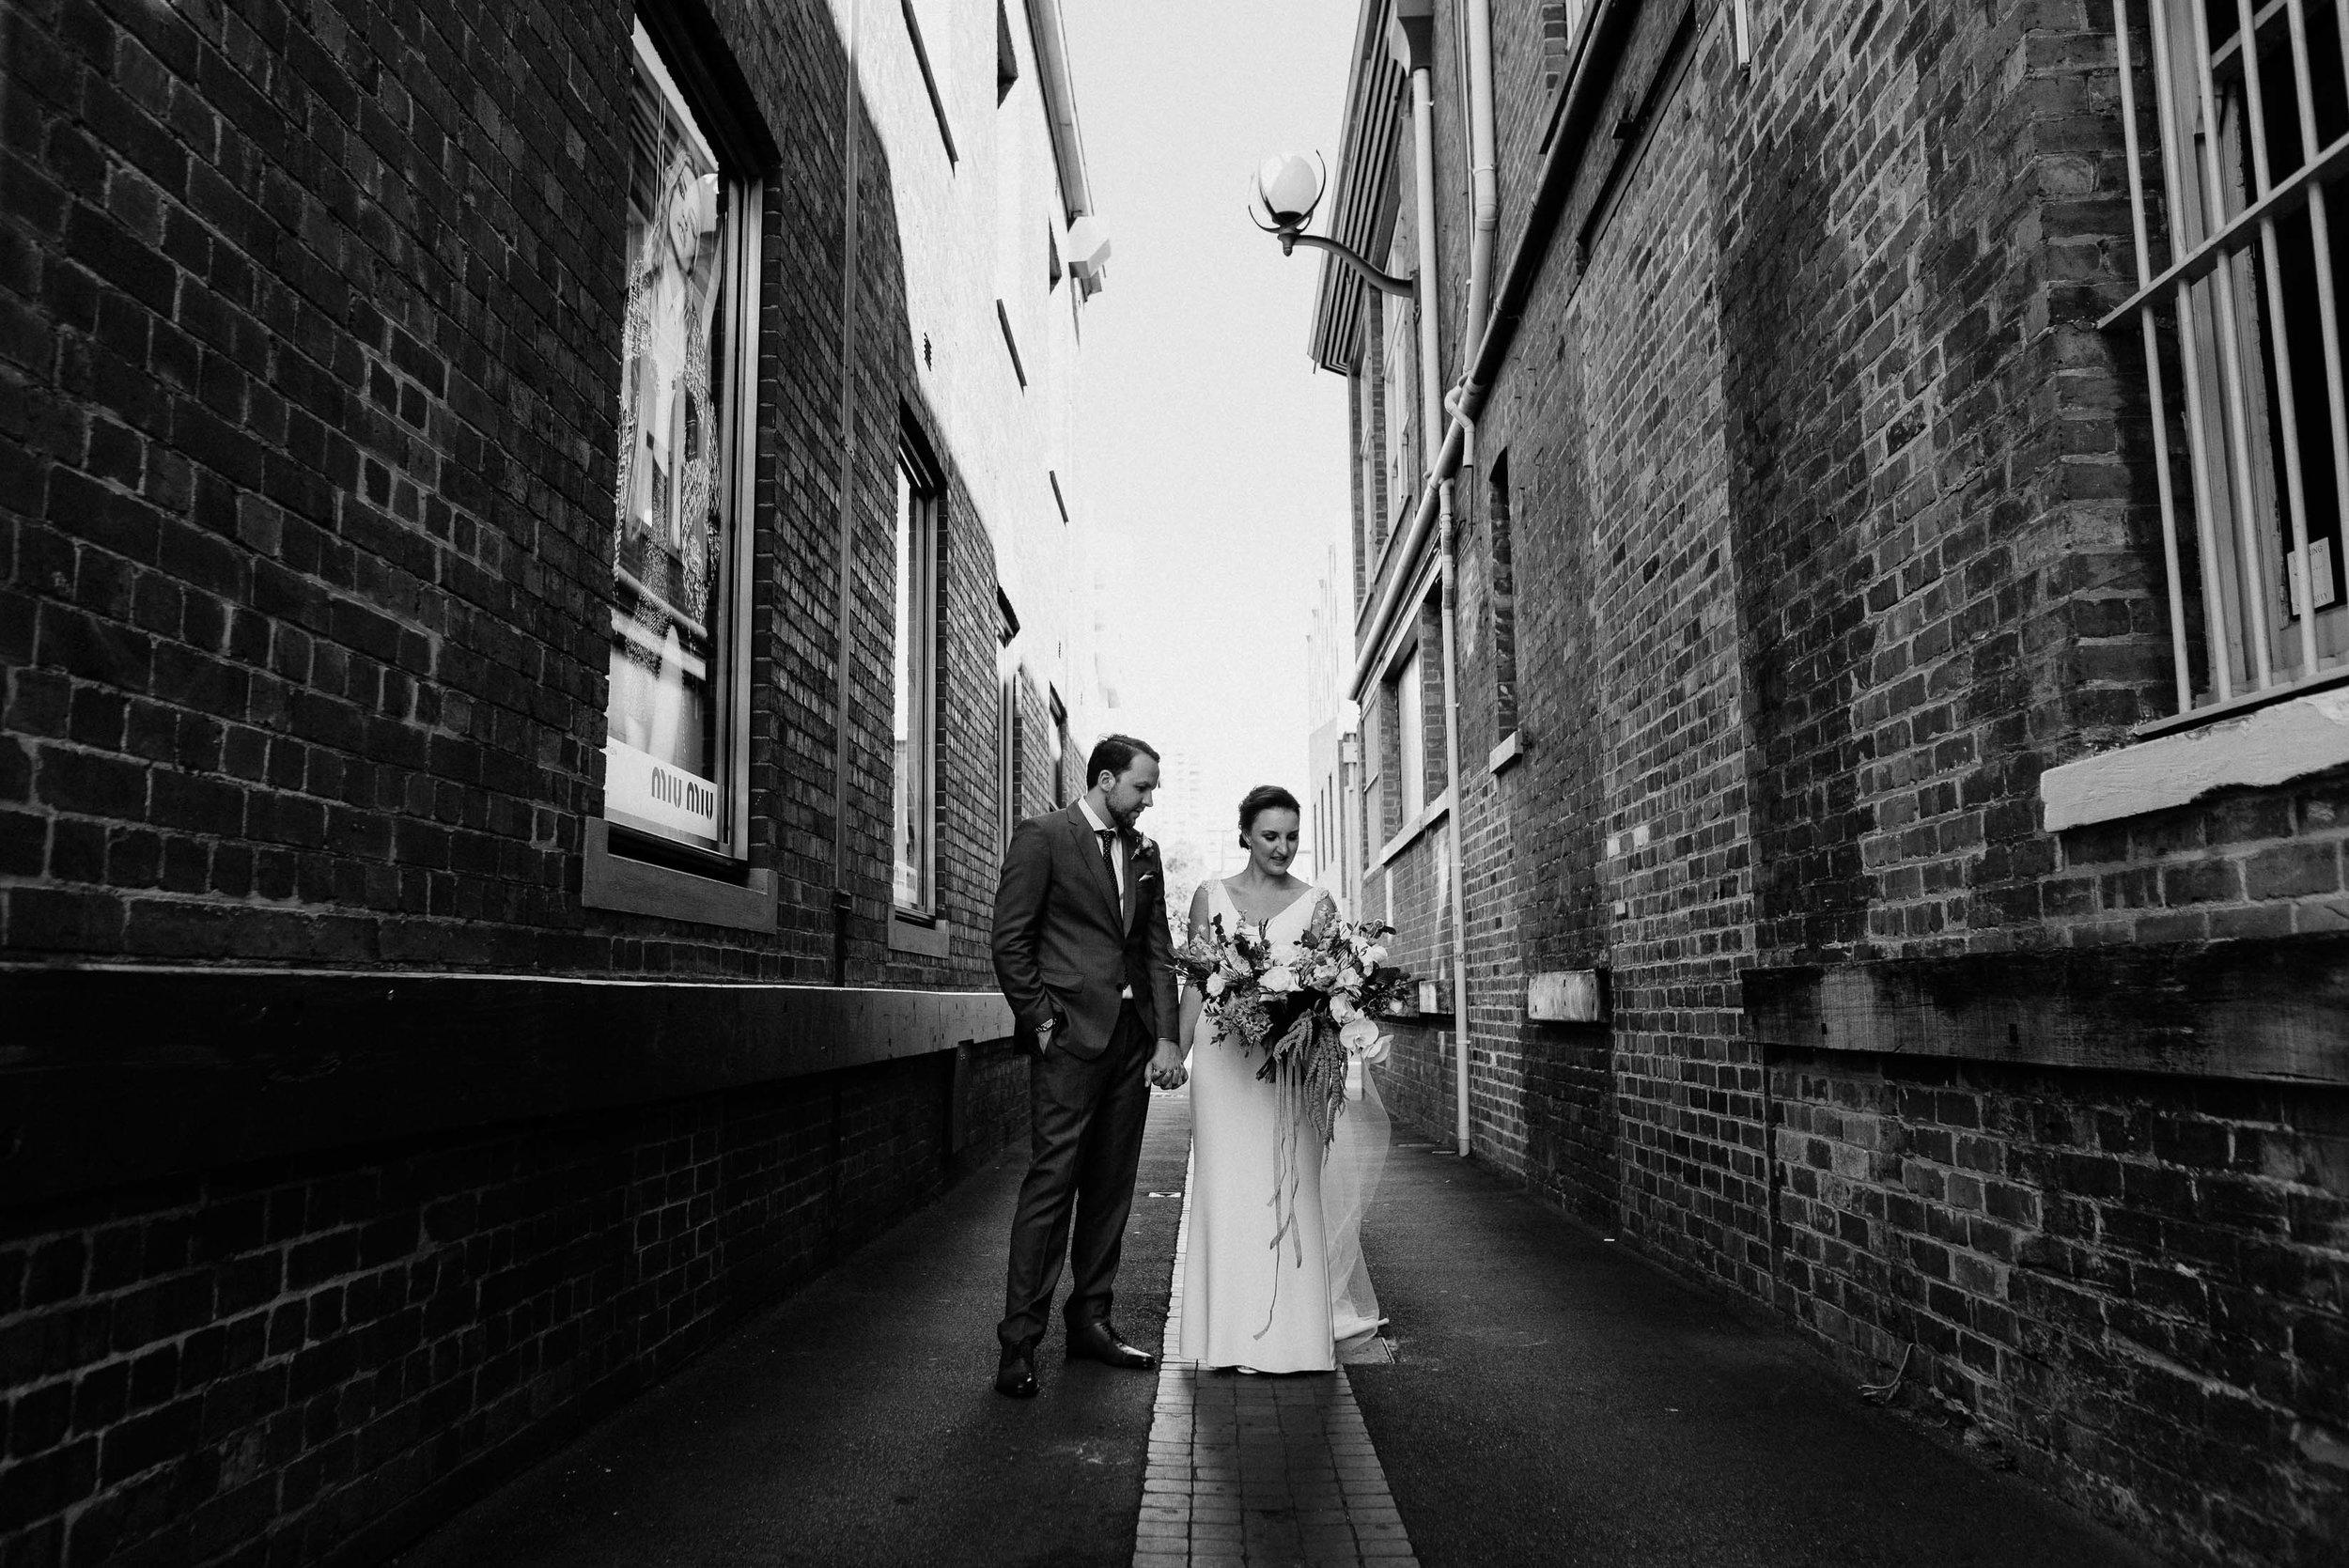 lauren-rodger-lamonts-bishops-perth-wedding-7.JPG